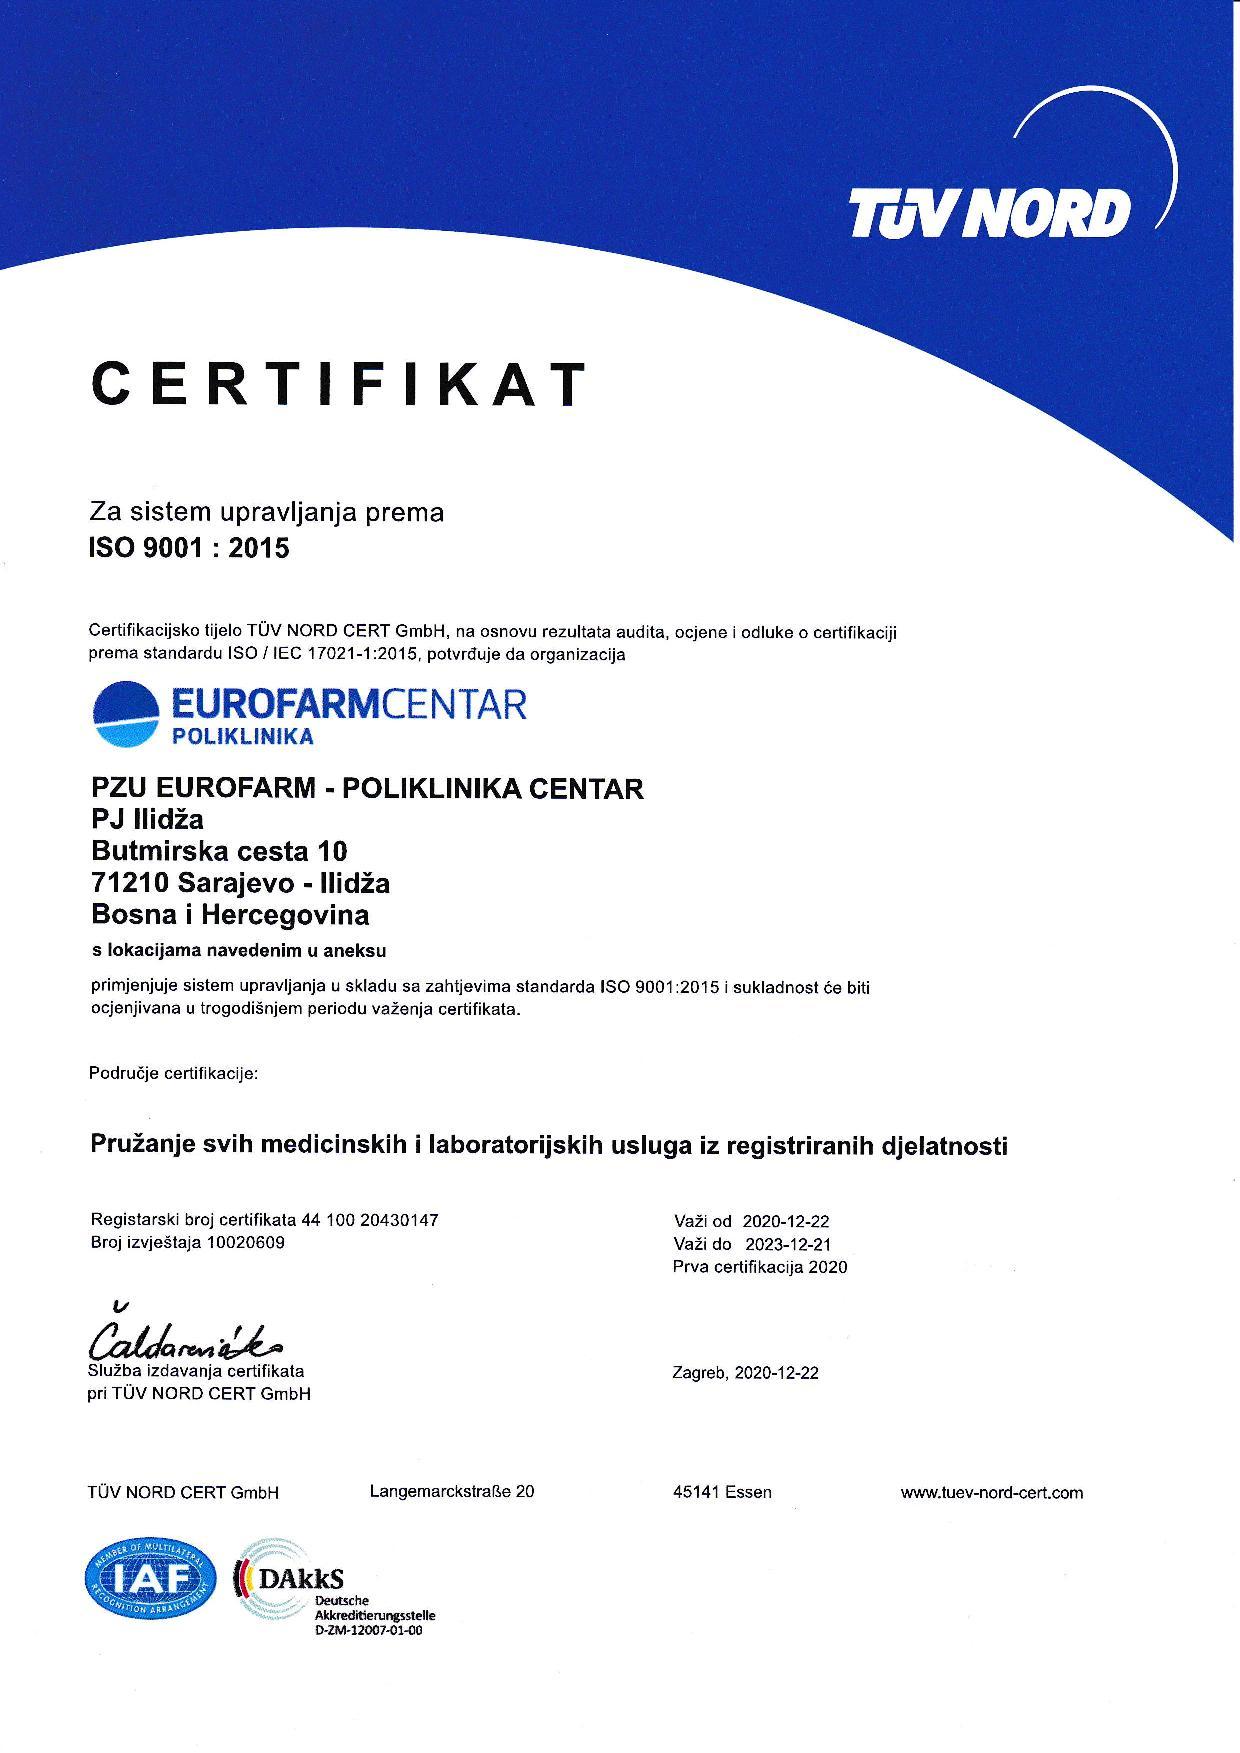 https://laboratorija.eurofarmcentar.ba/wp-content/uploads/2021/05/EUROFARM-BOS-1-page-001.jpg